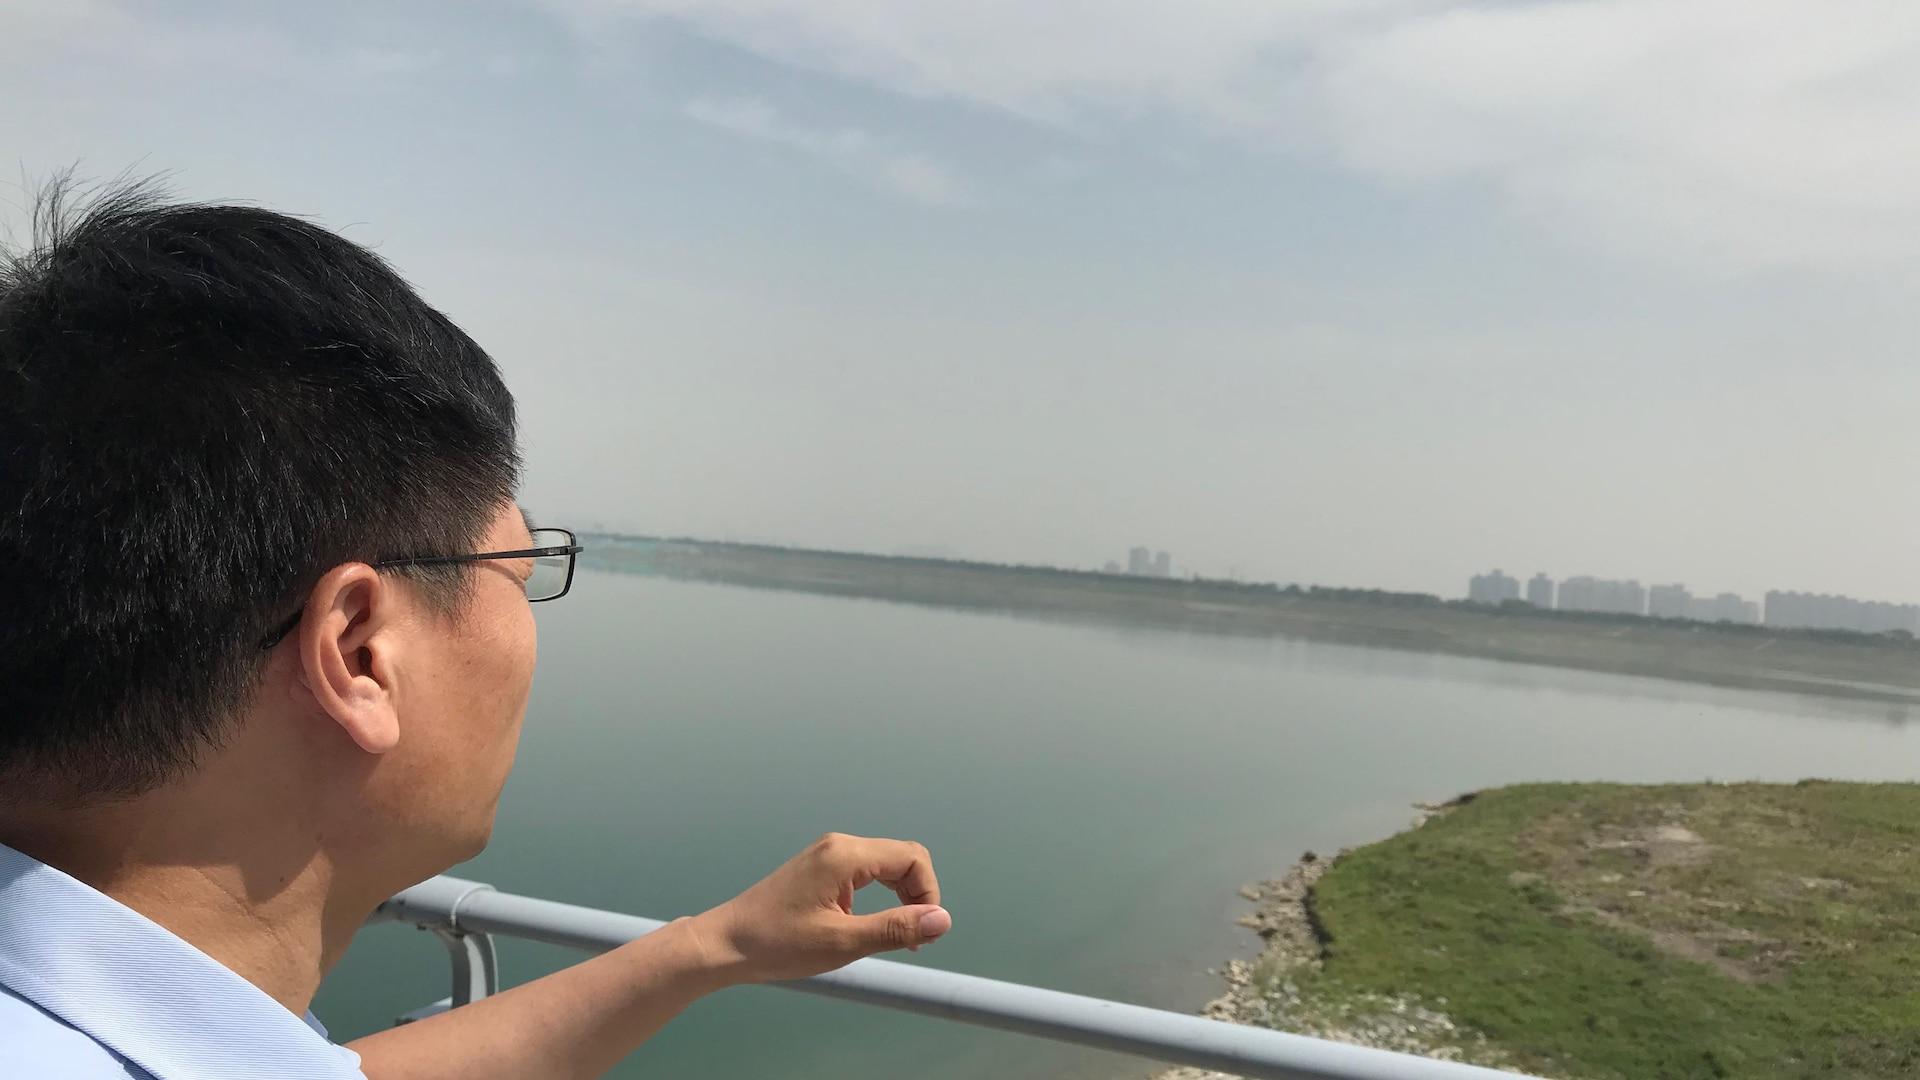 Liu Jinshu pointe l'horizon au loin